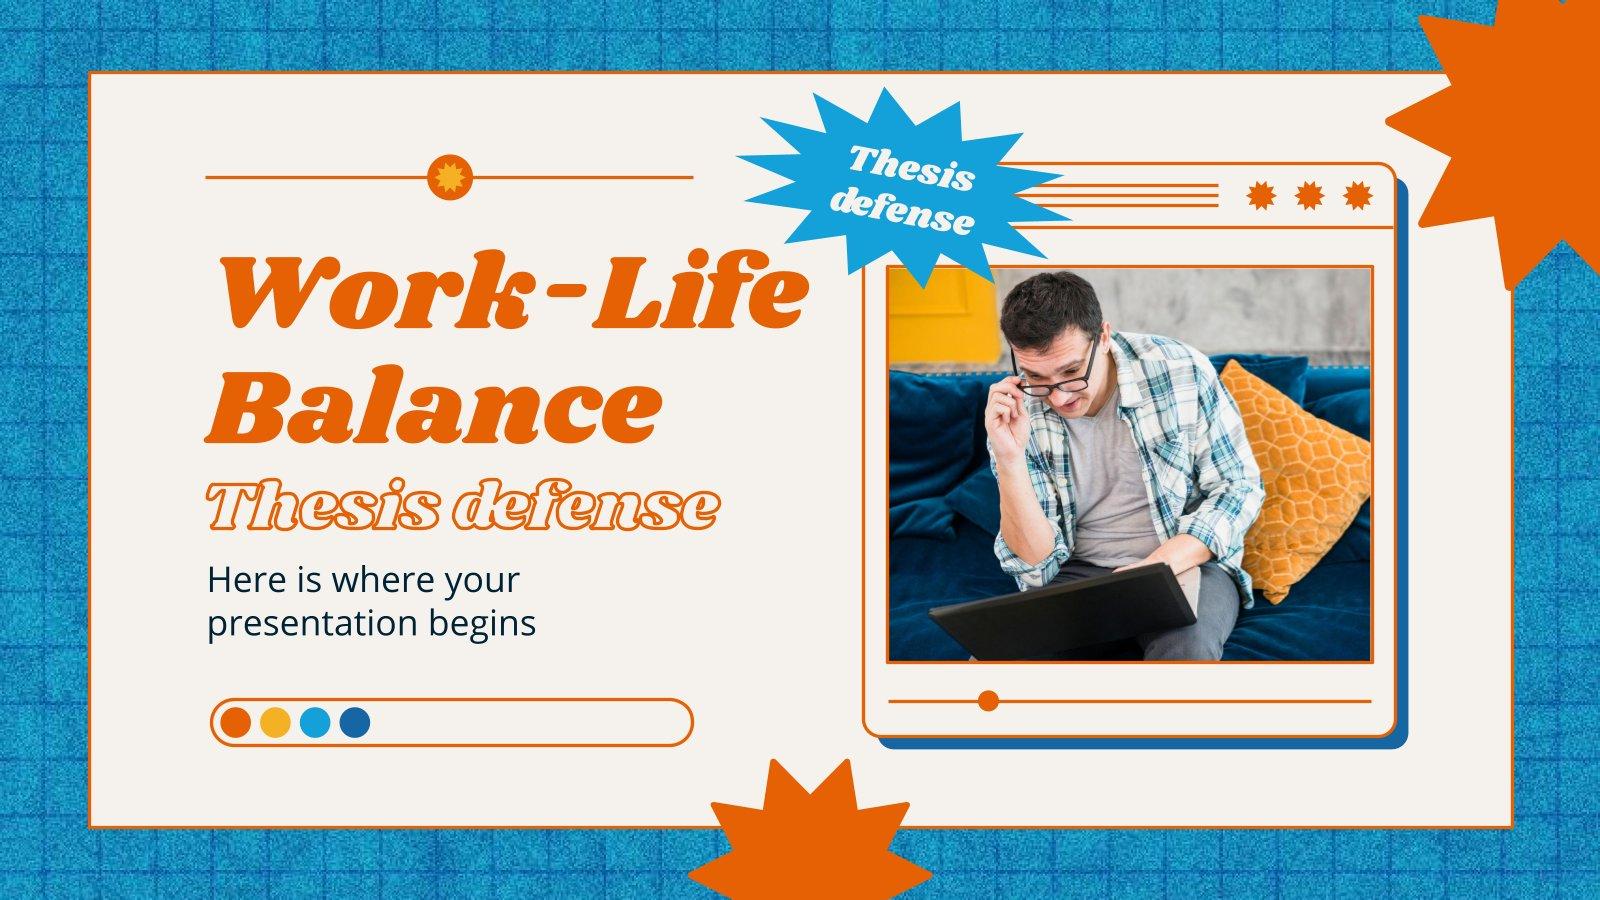 Work-Life Balance Thesis Defense presentation template